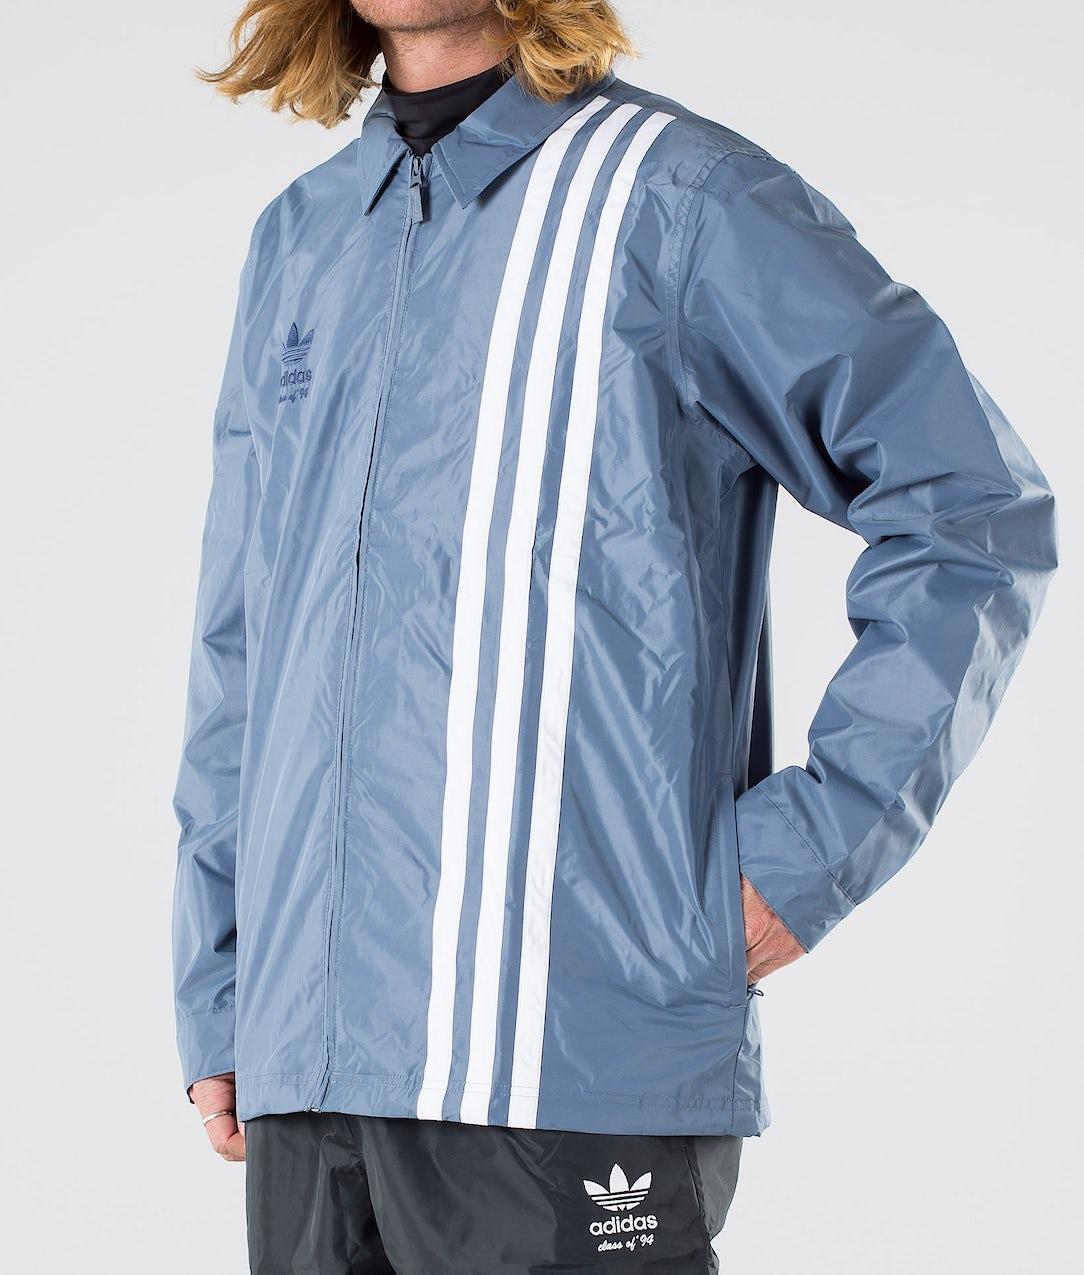 Adidas Snowboarding Civilian Snowboard Jacket Raw Steel S18 Easy Yellow White Ridestore Com